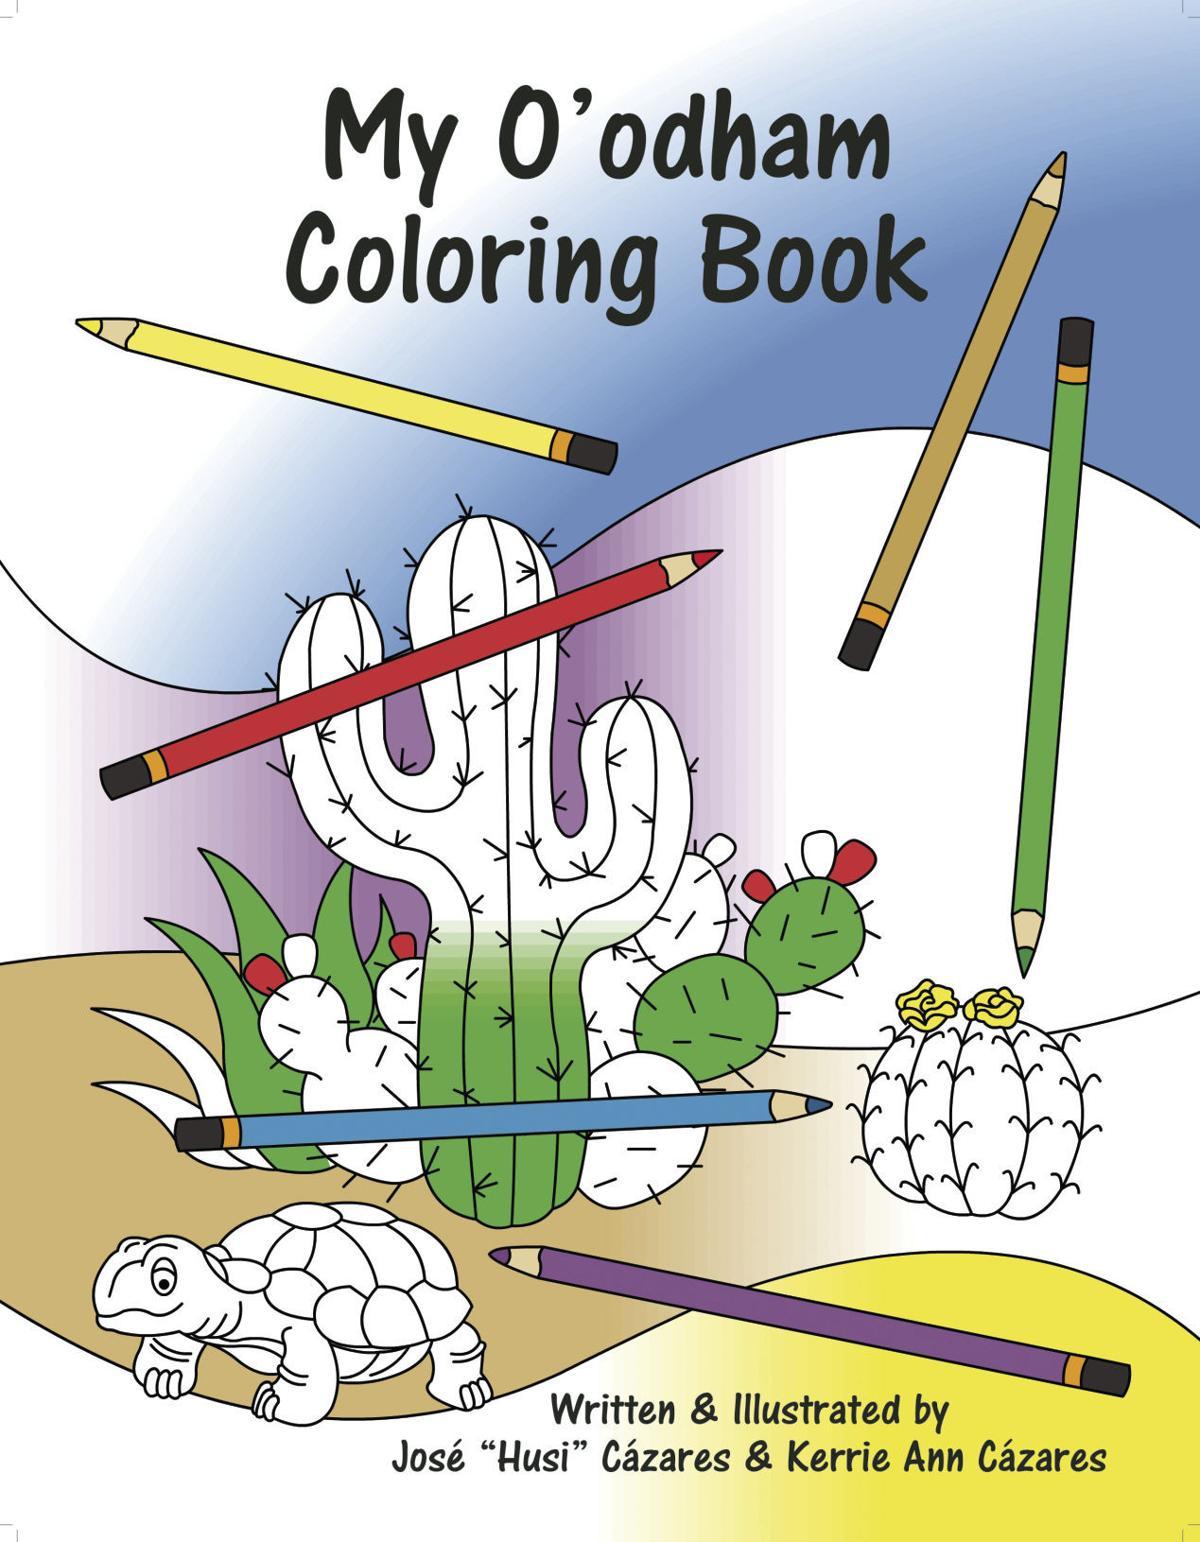 My O'odham Coloring Book